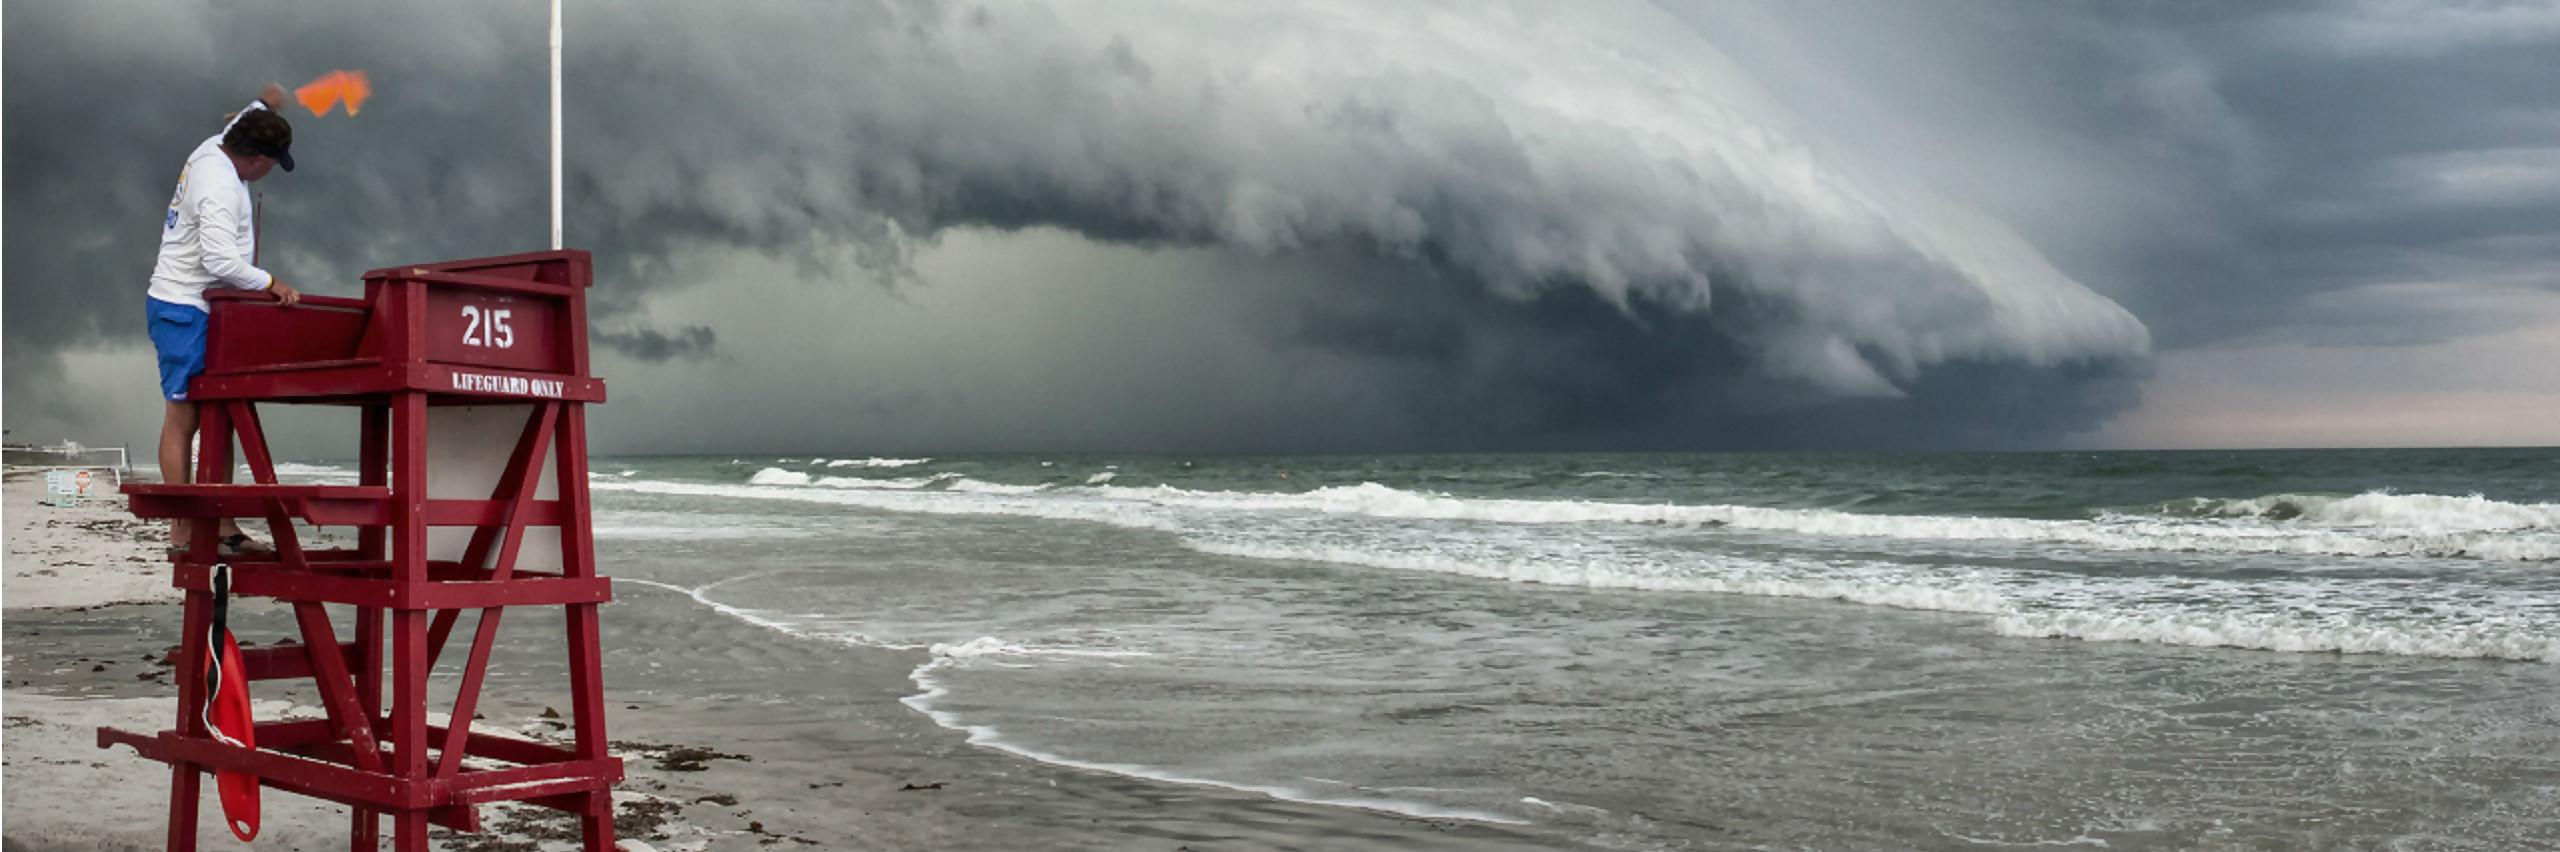 Cyclone Debbie - Townsville